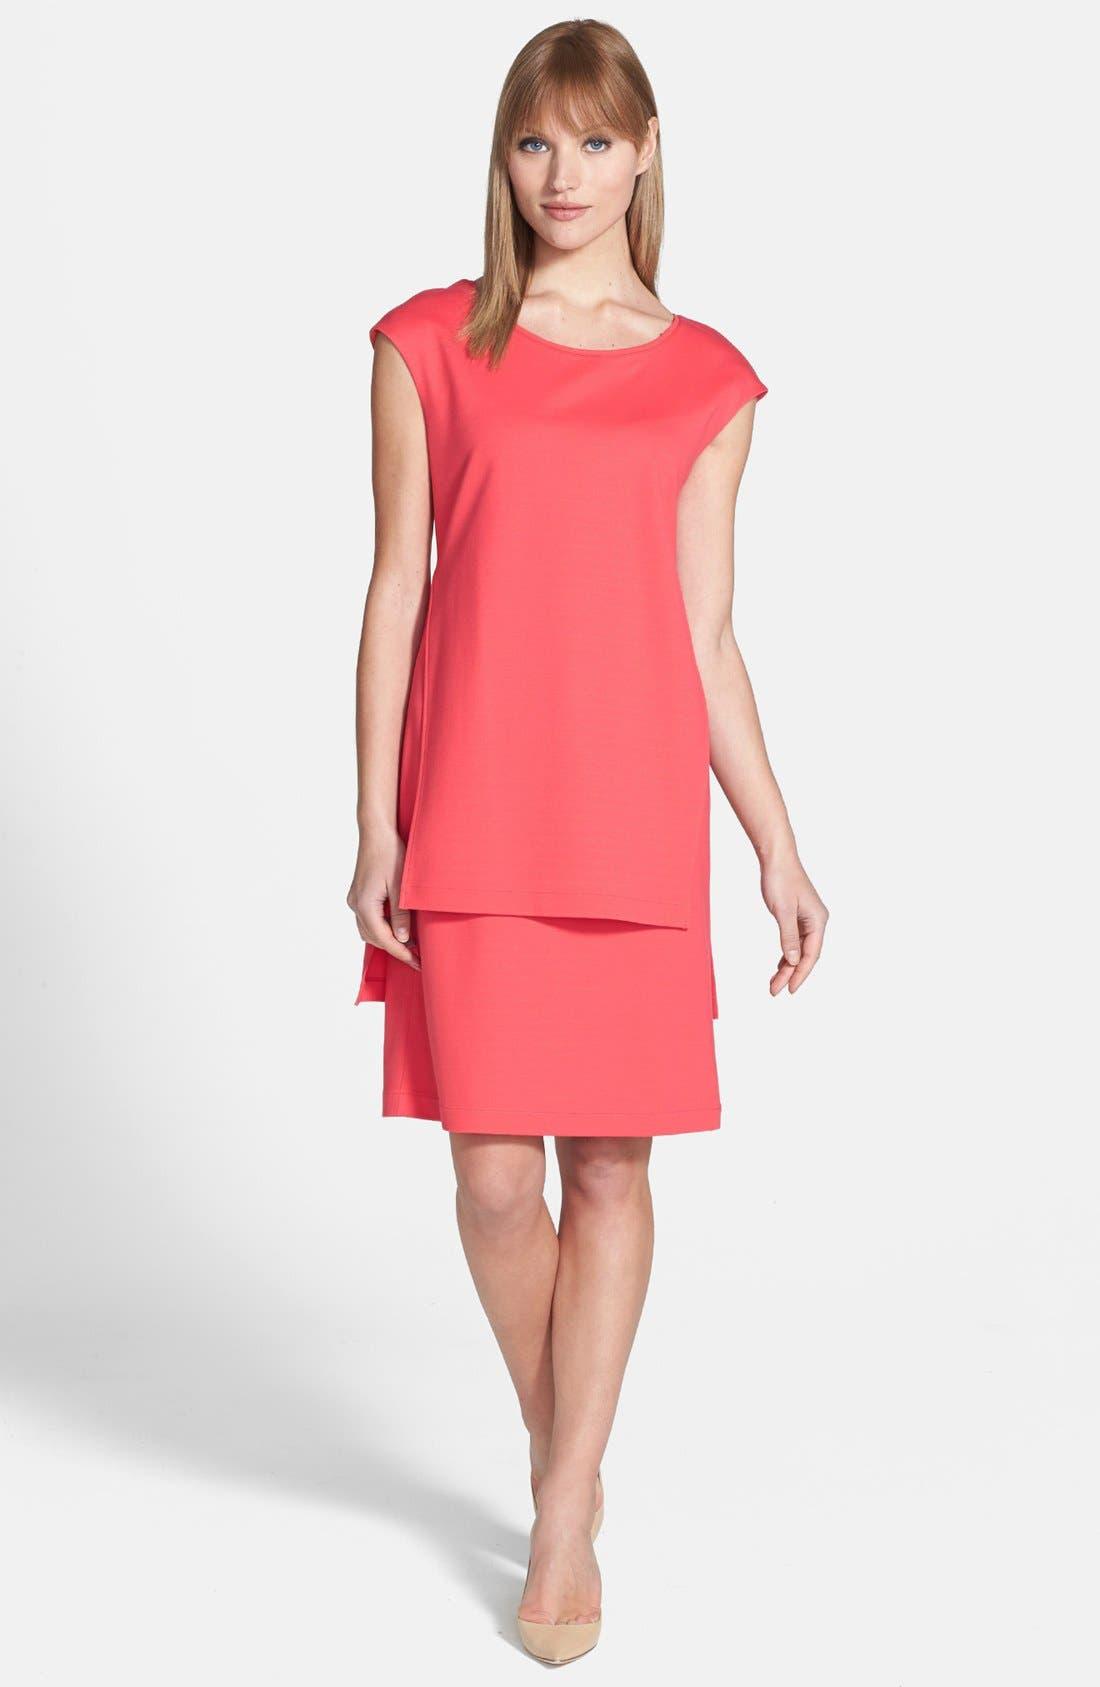 Alternate Image 1 Selected - Lafayette 148 New York  Layered Punto Milano Dress